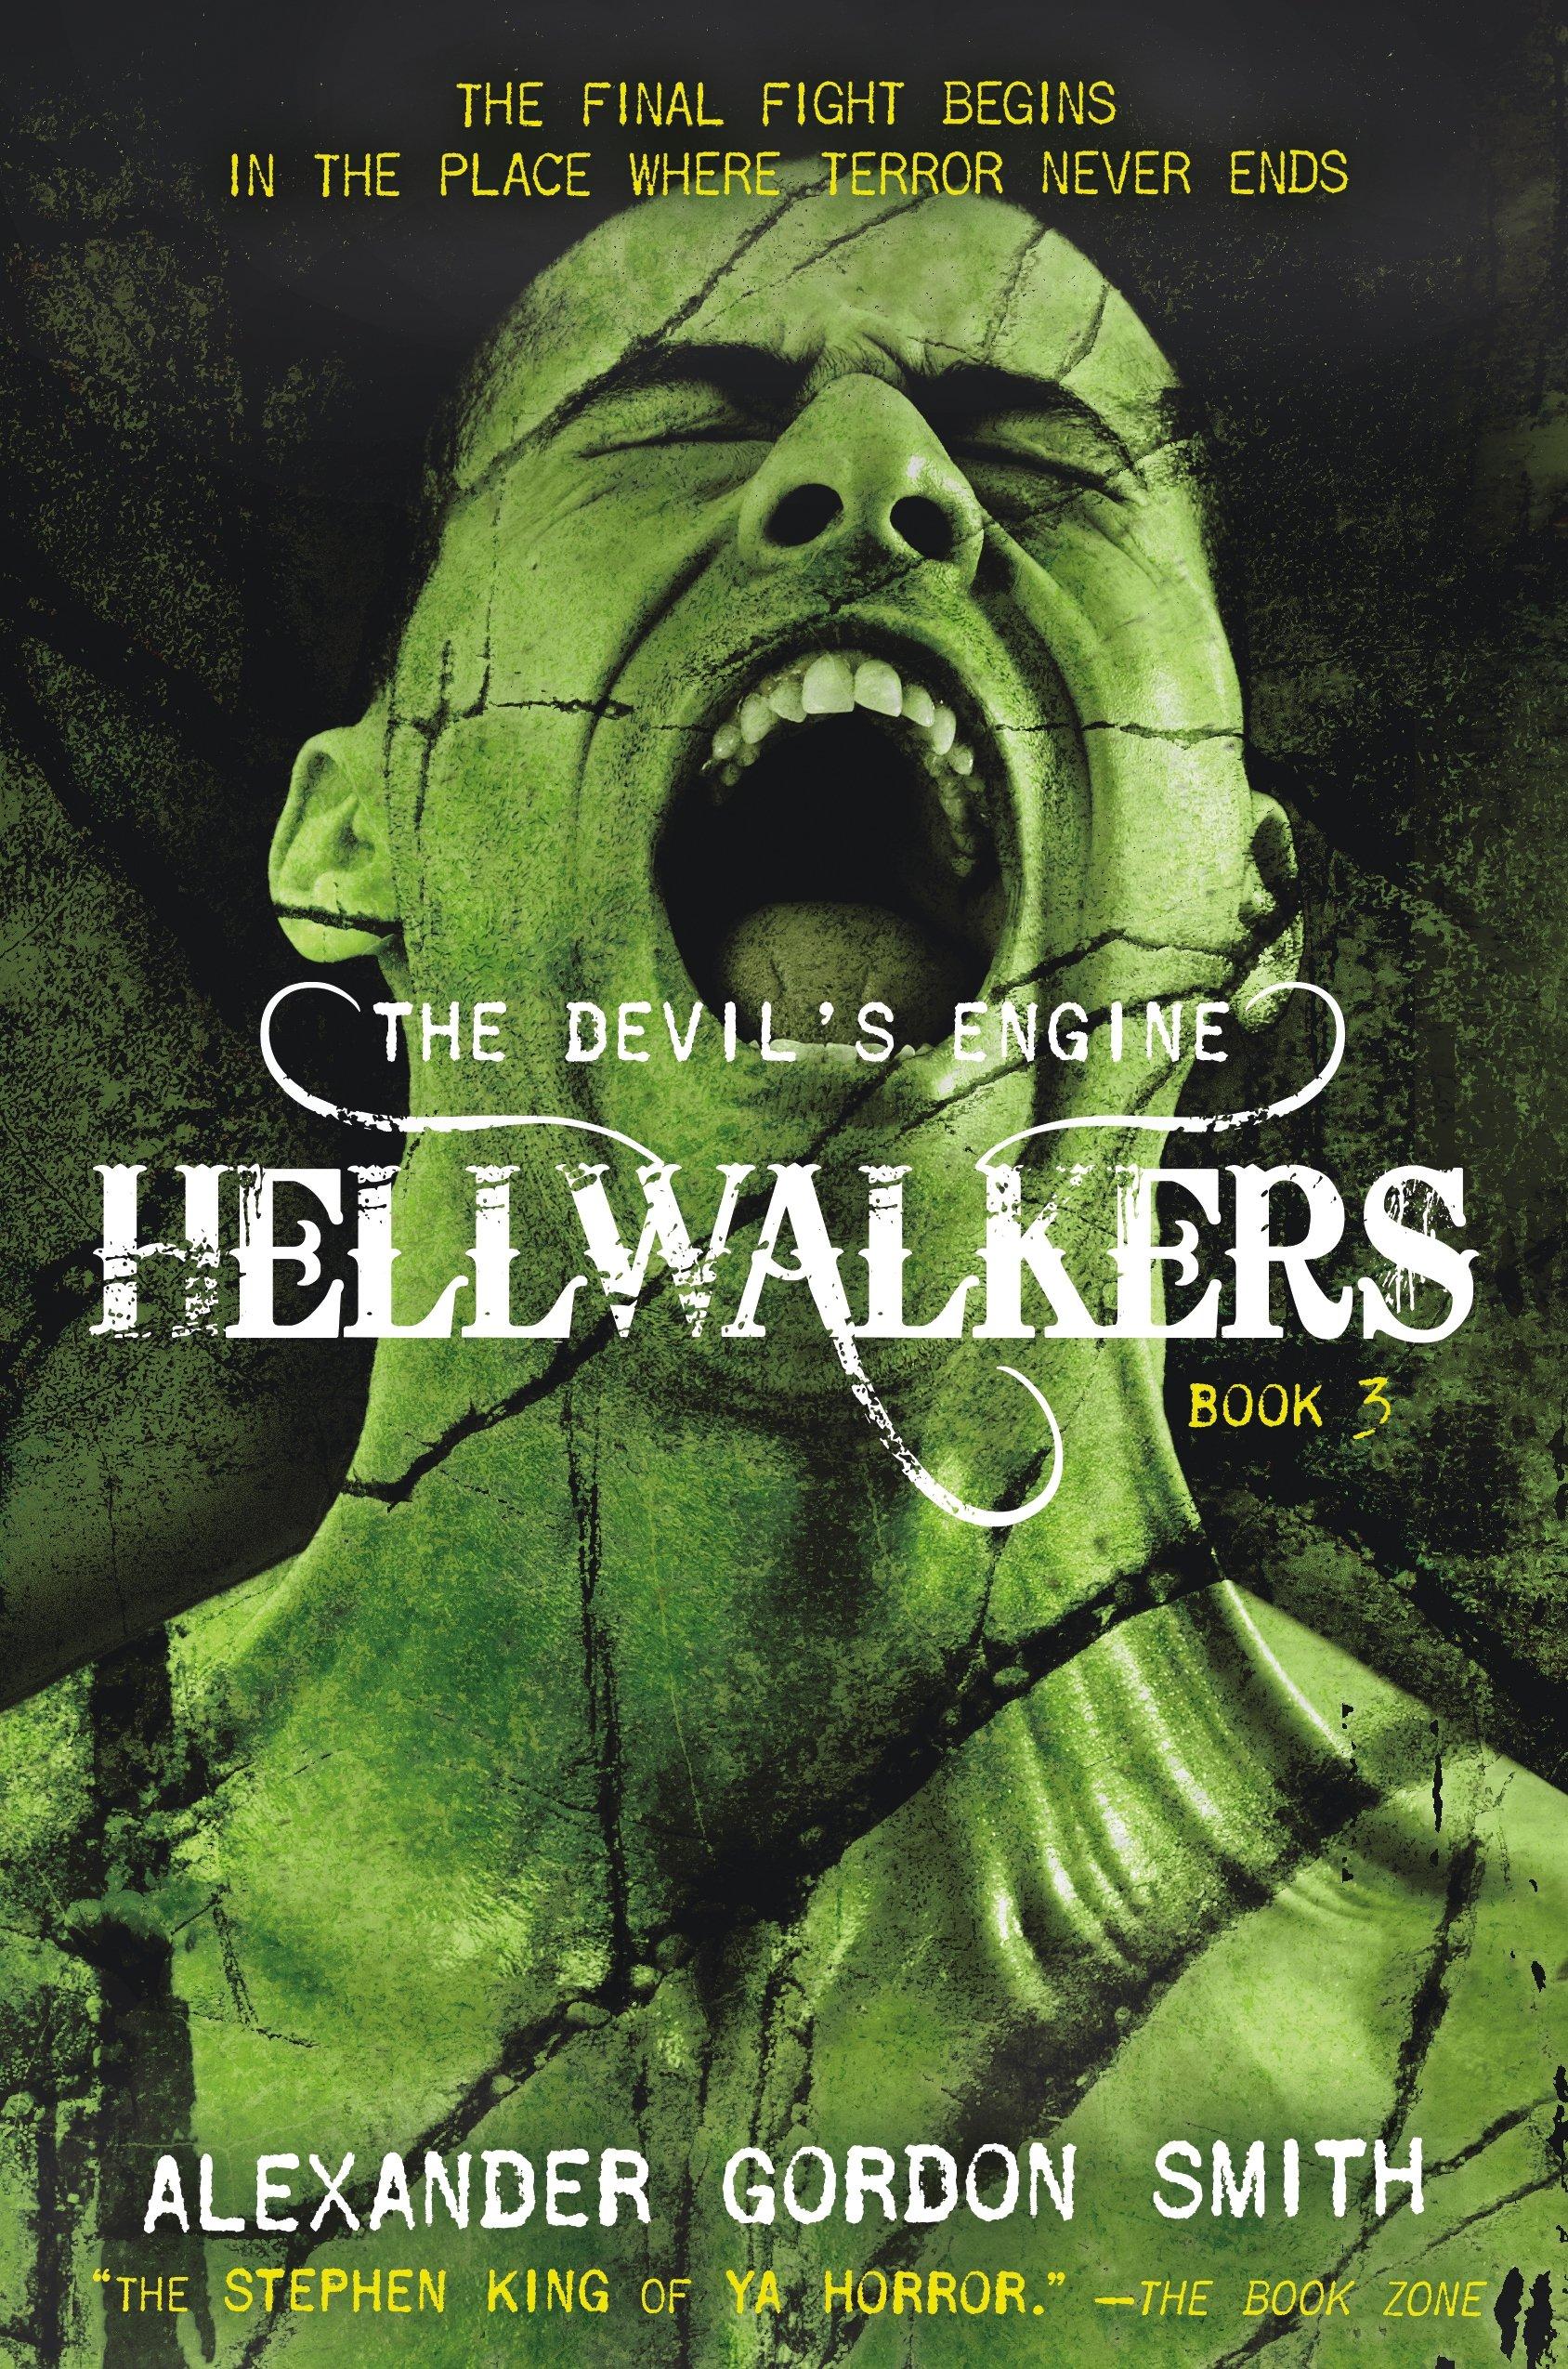 Read Online The Devil's Engine: Hellwalkers: (Book 3) PDF